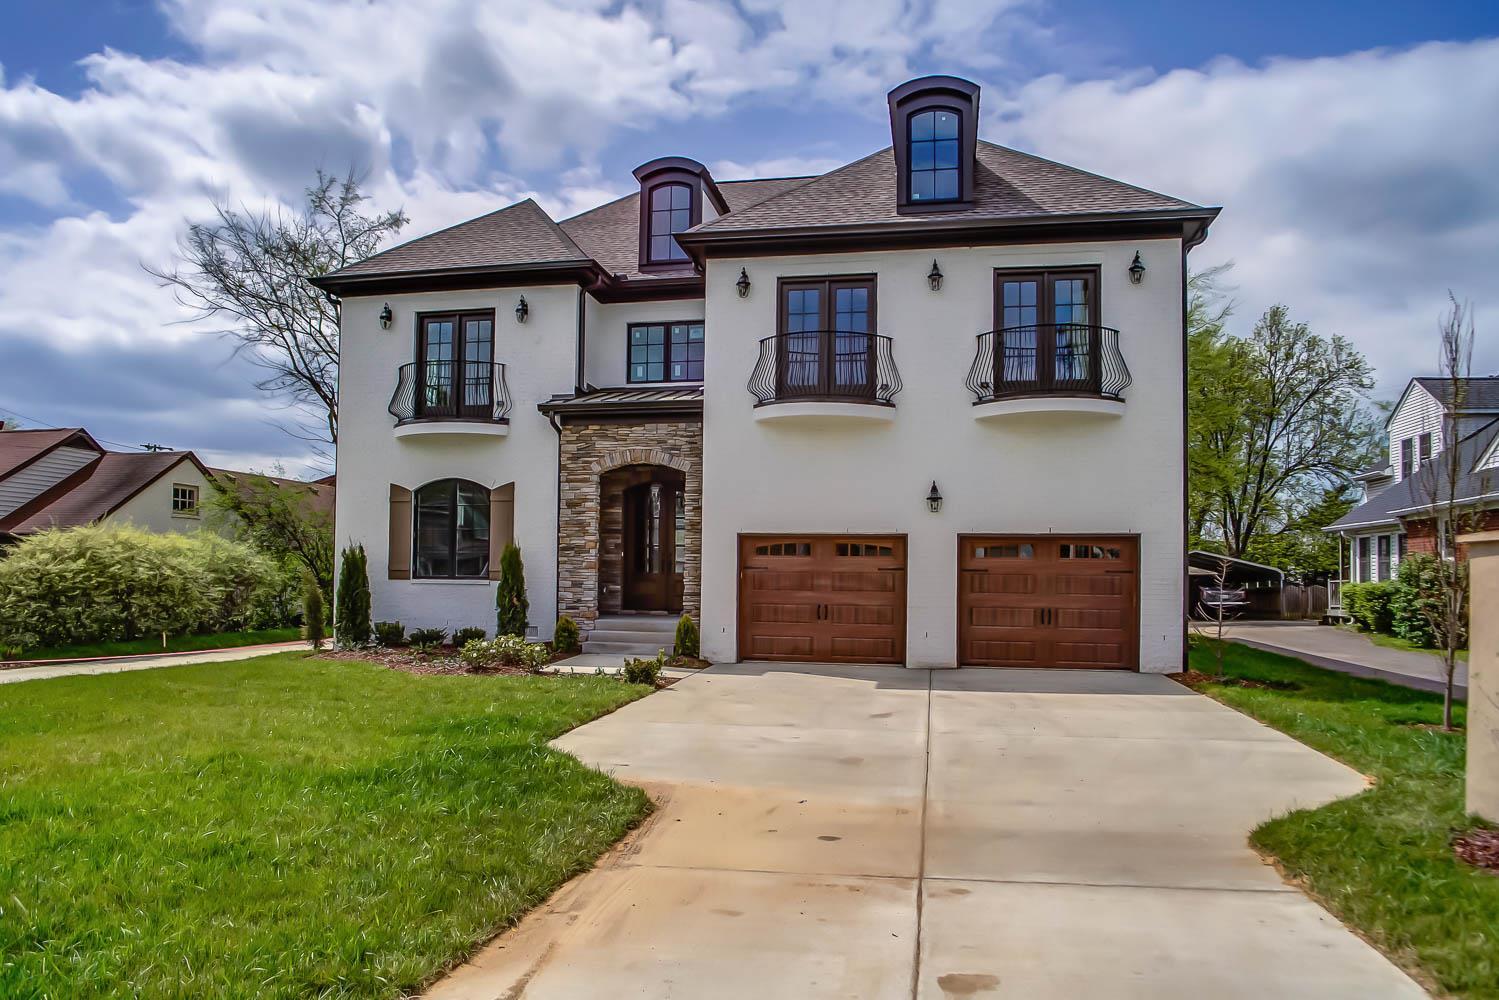 4111A Lone Oak Rd, Nashville - Green Hills, Tennessee